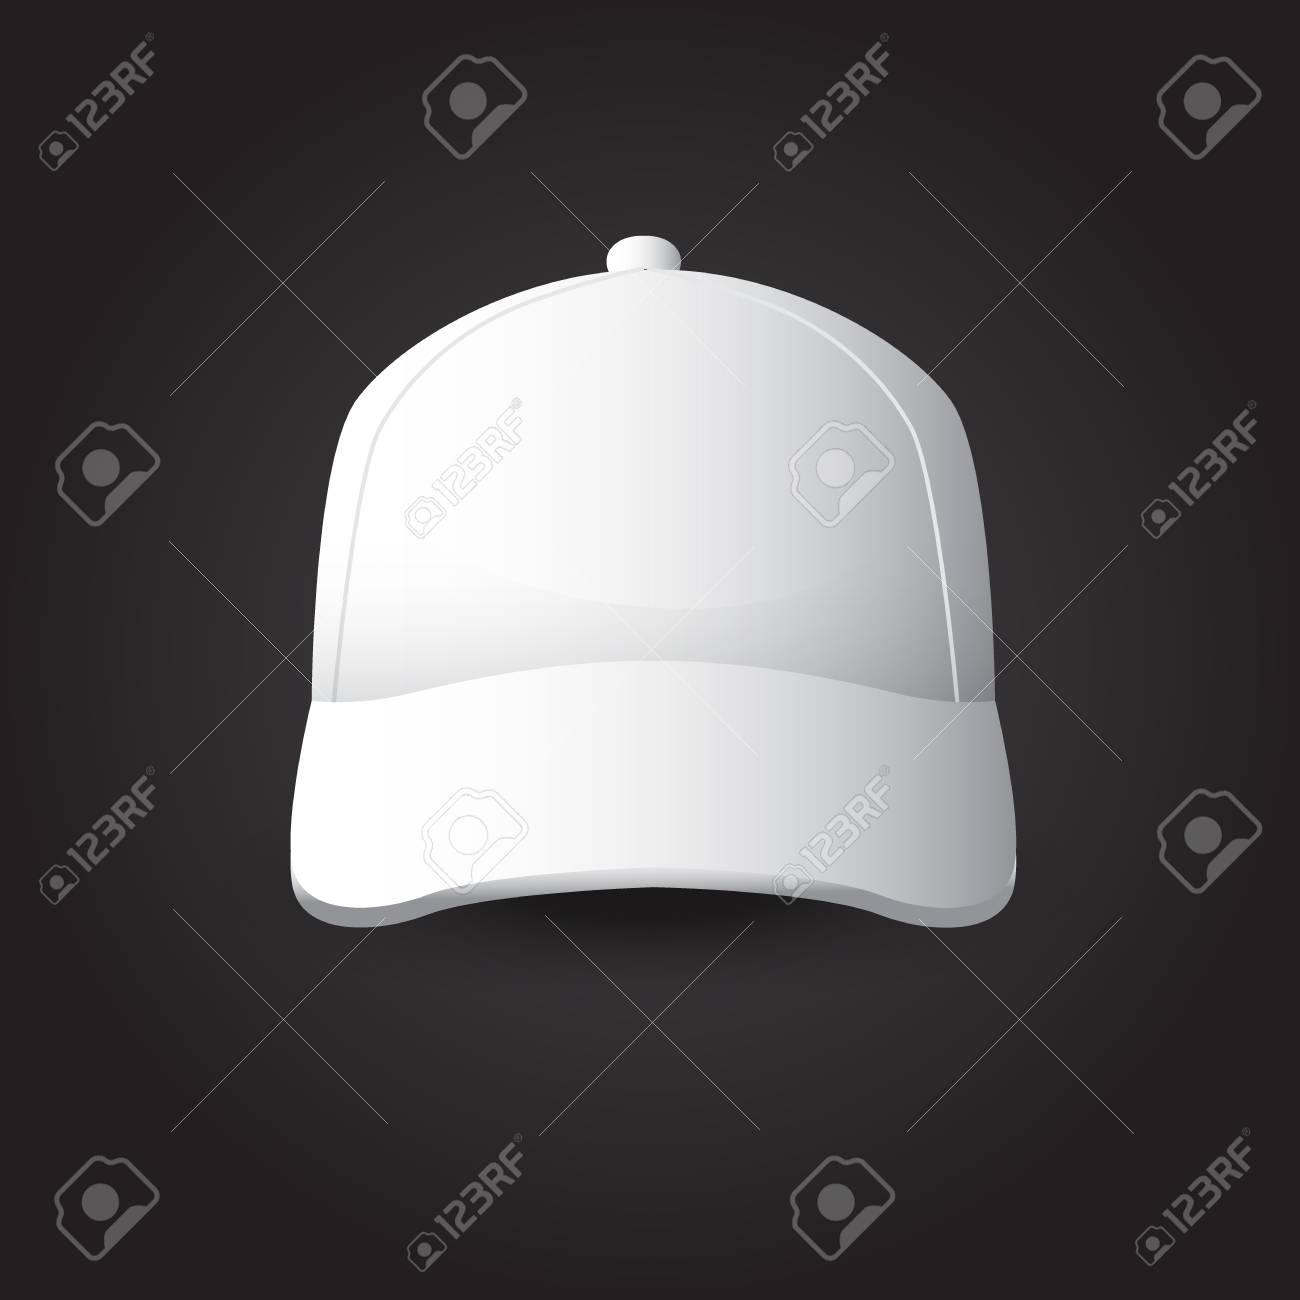 Foto de archivo - Juego de maqueta de gorra de béisbol blanca 26d8c639ca2